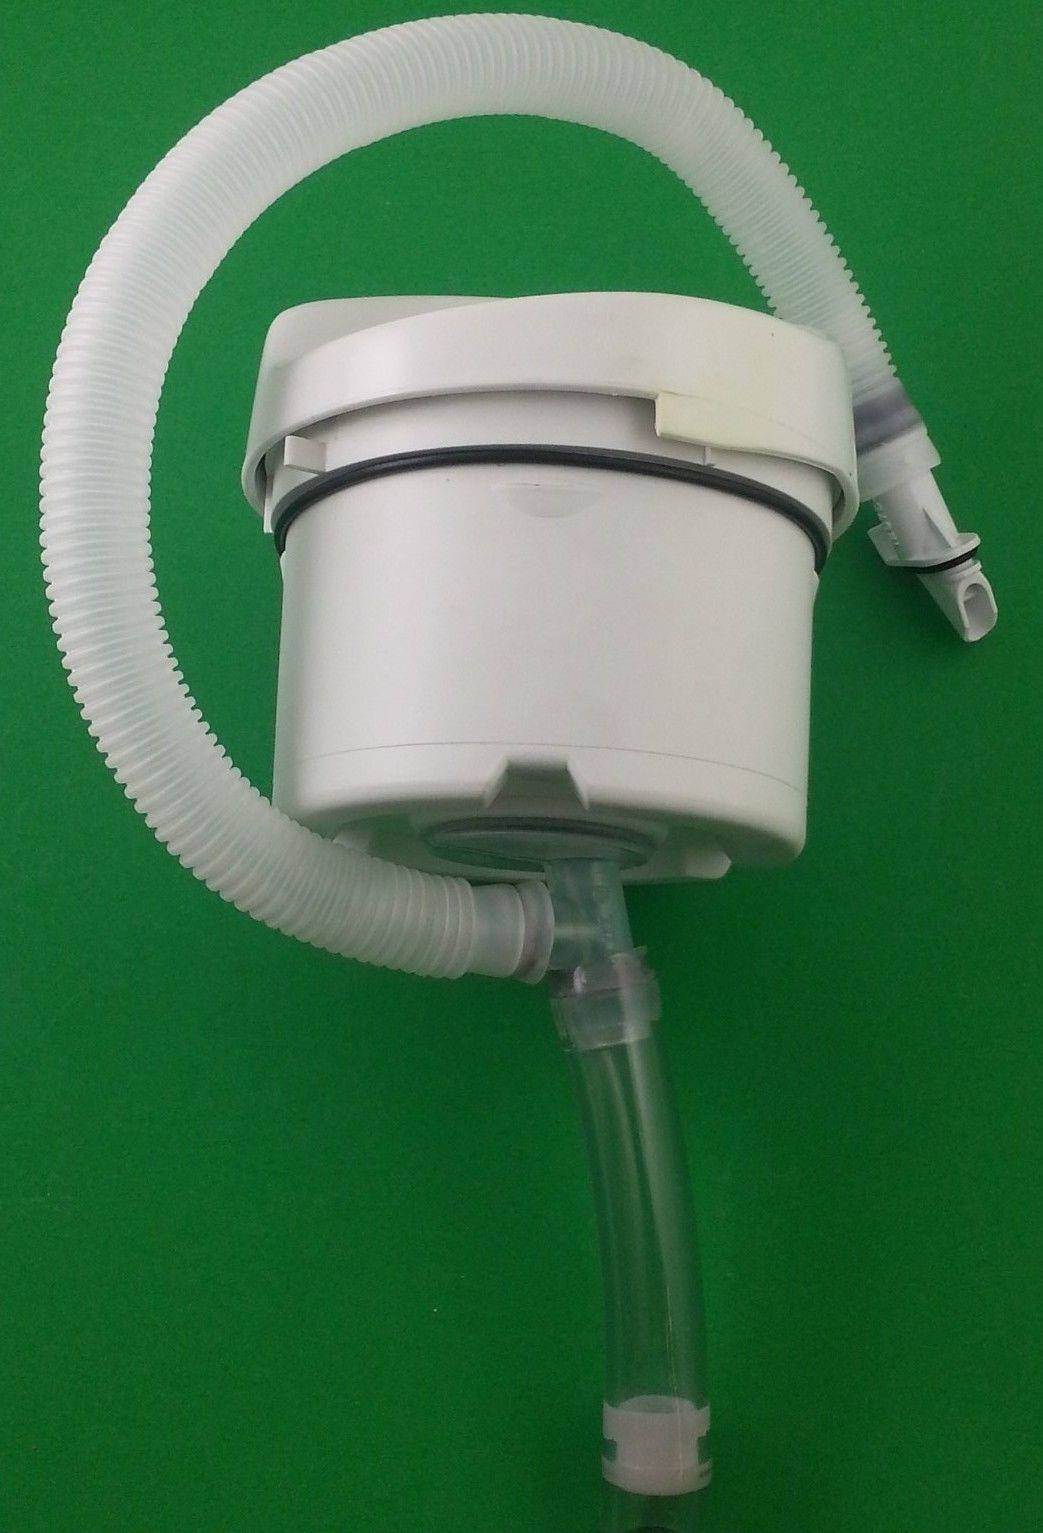 thetford cassette toilet manual flush repair